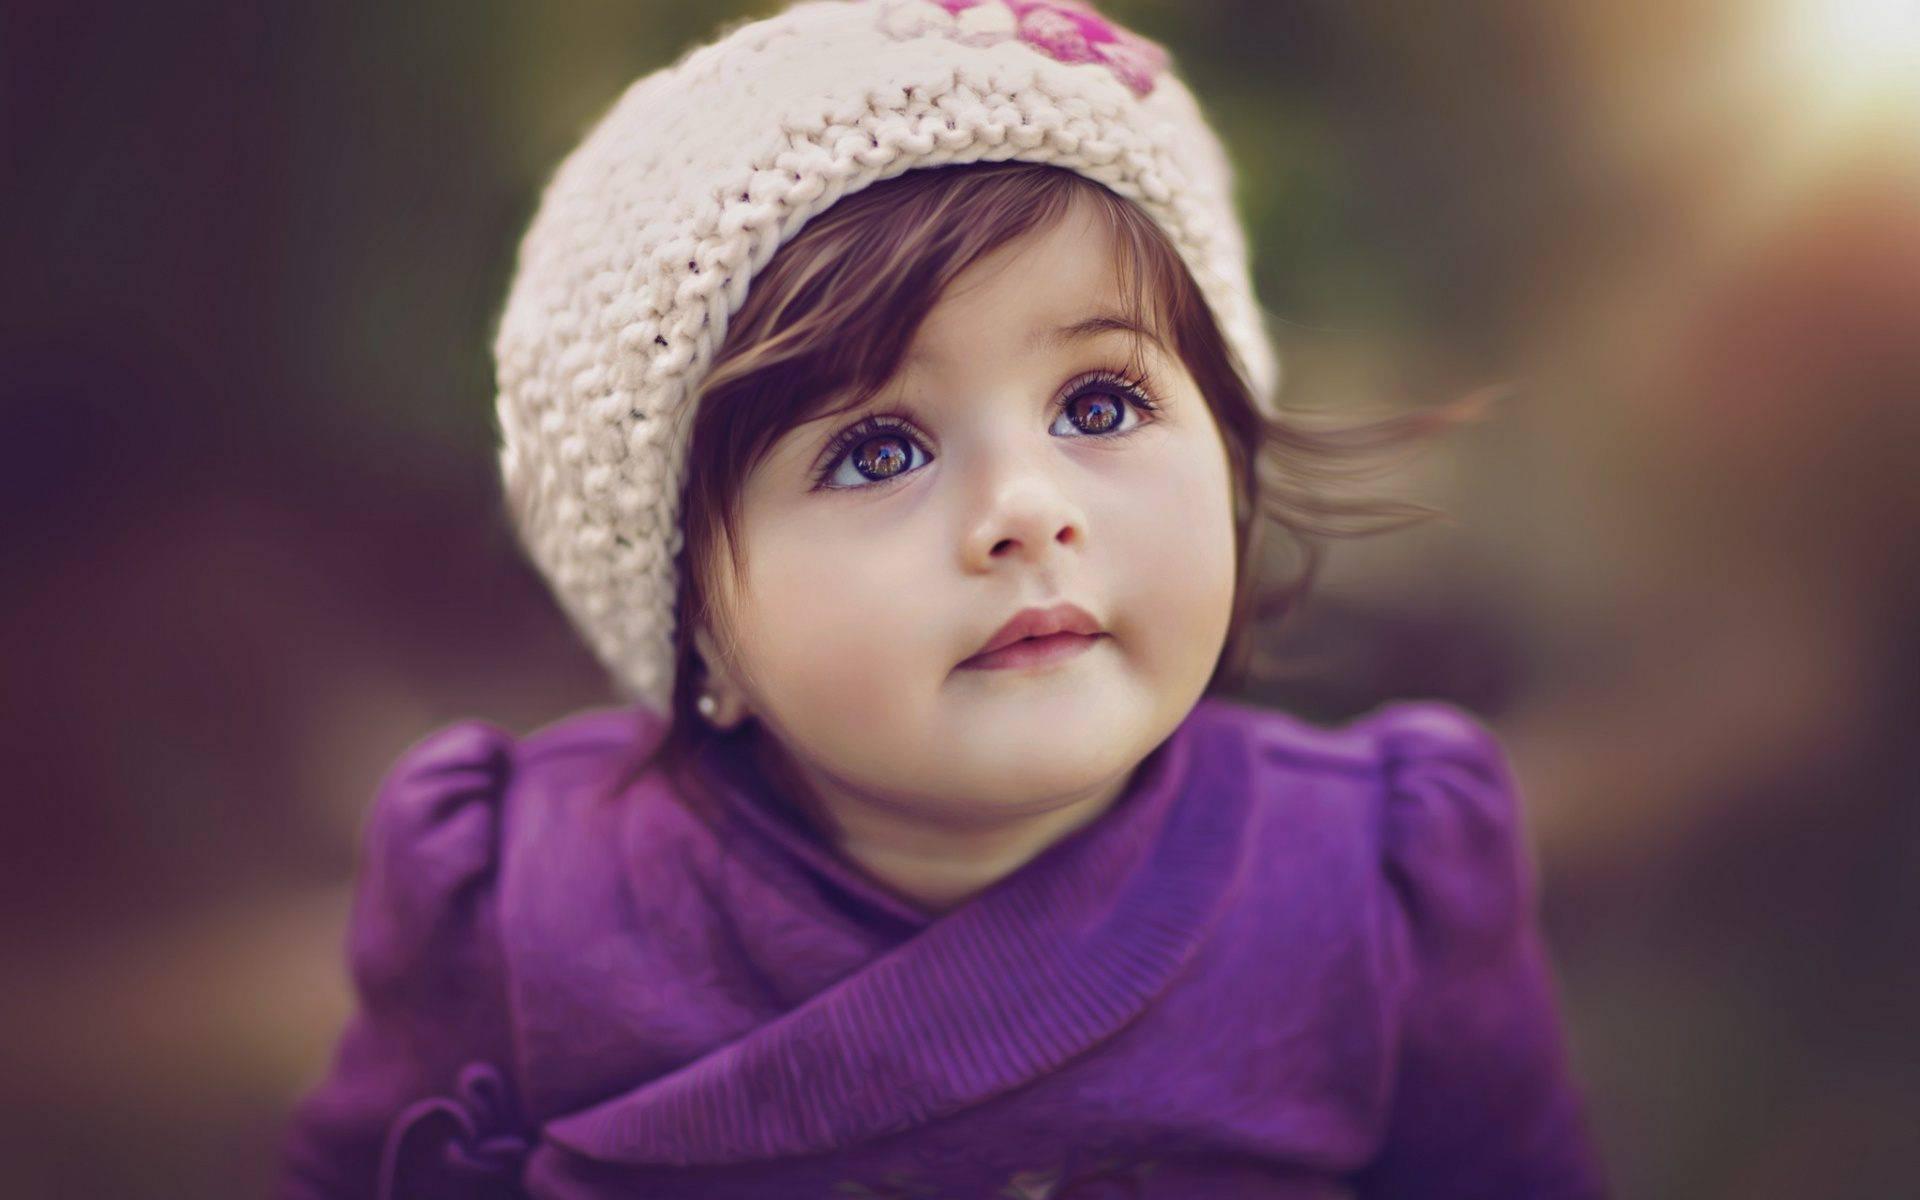 بالصور صور بنات للواتس , اجمل صور لبنات الواتس 3497 1